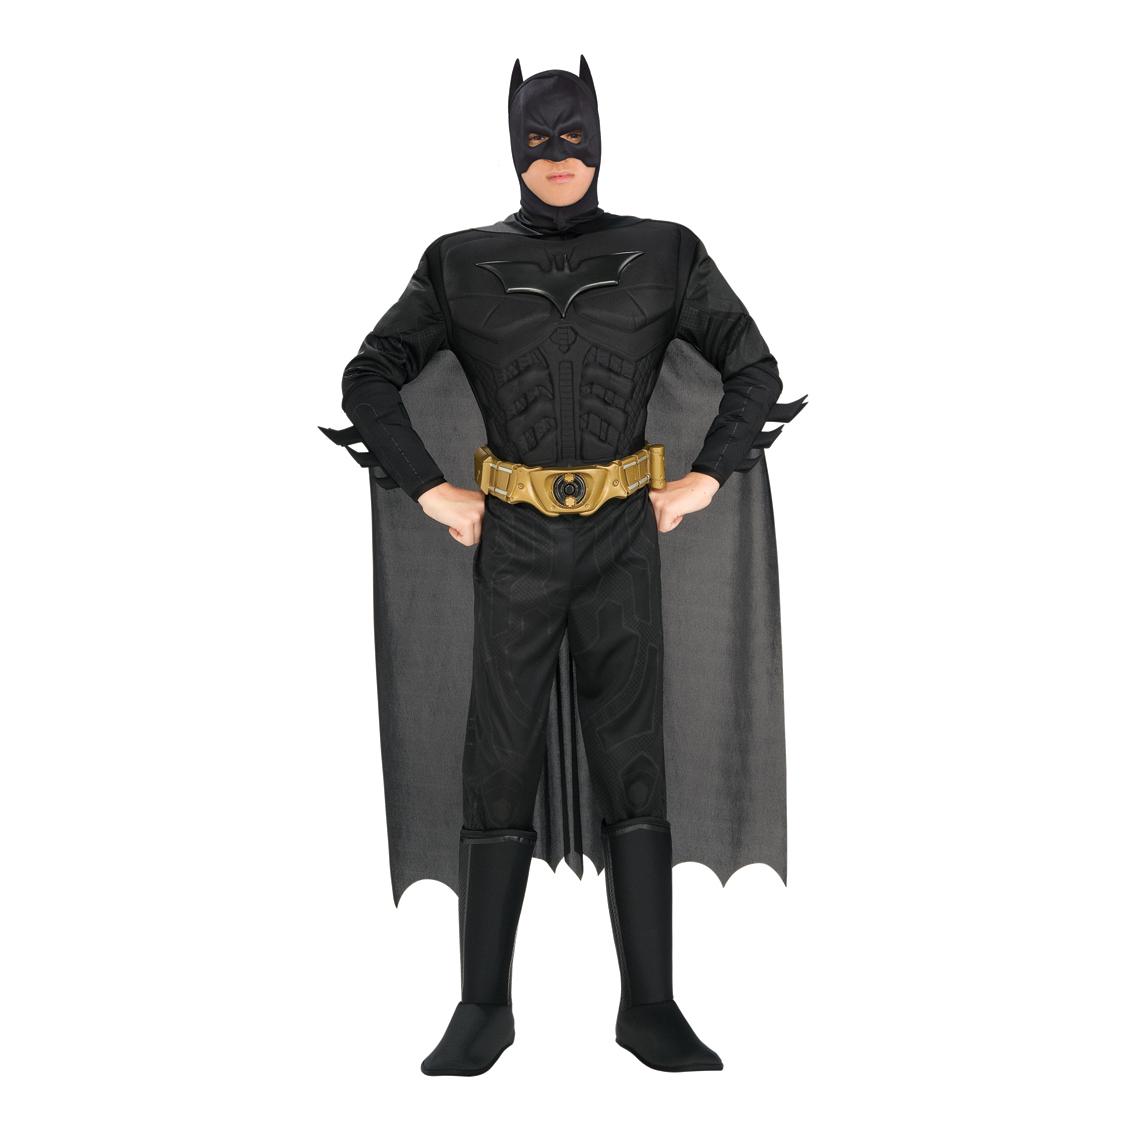 Batman Deluxe Maskeraddräkt